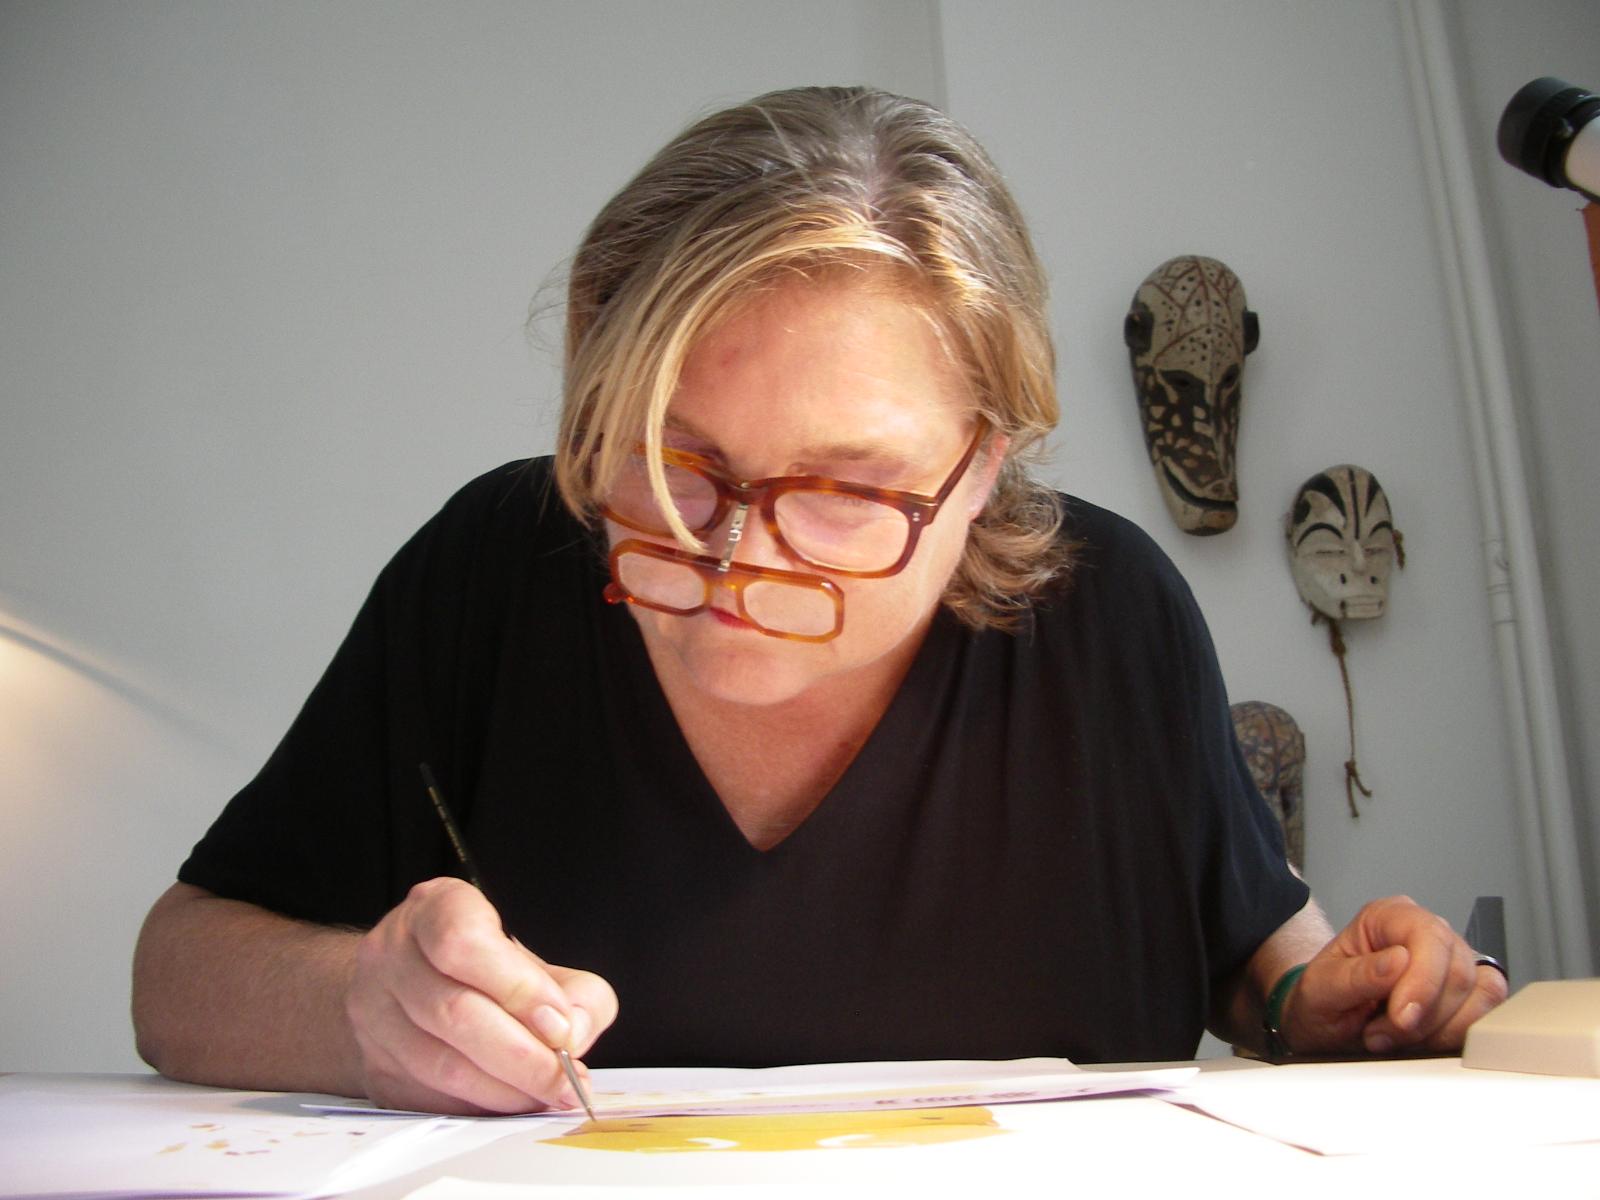 Cornelia Hesse-Honegger painting